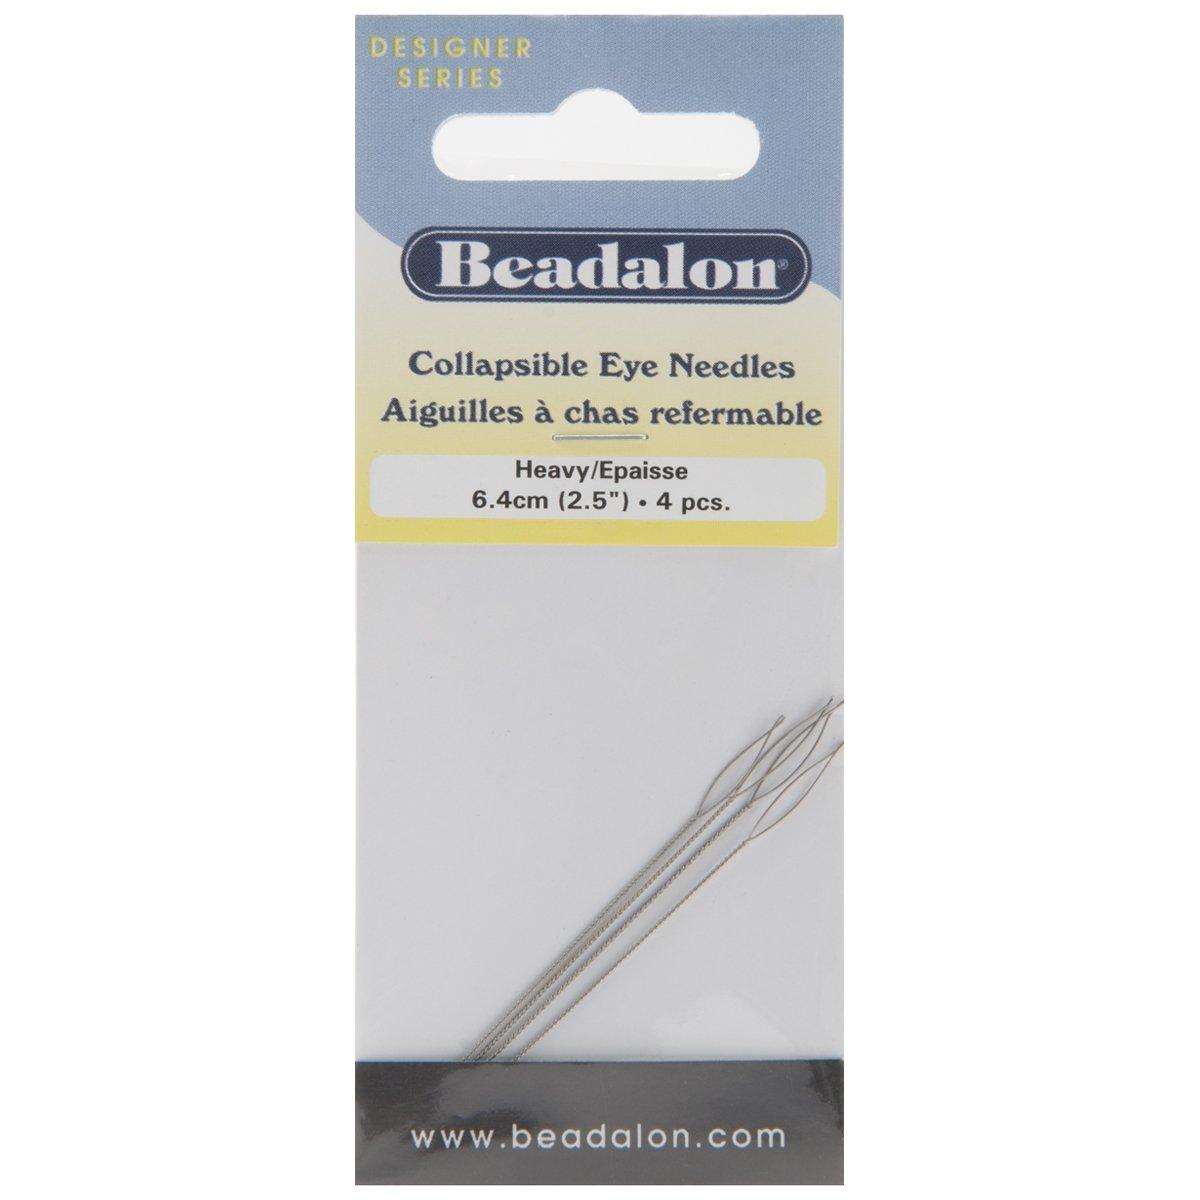 Collapsible Eye Needles 2.5 4/Pkg-Heavy Beadalon 27141639